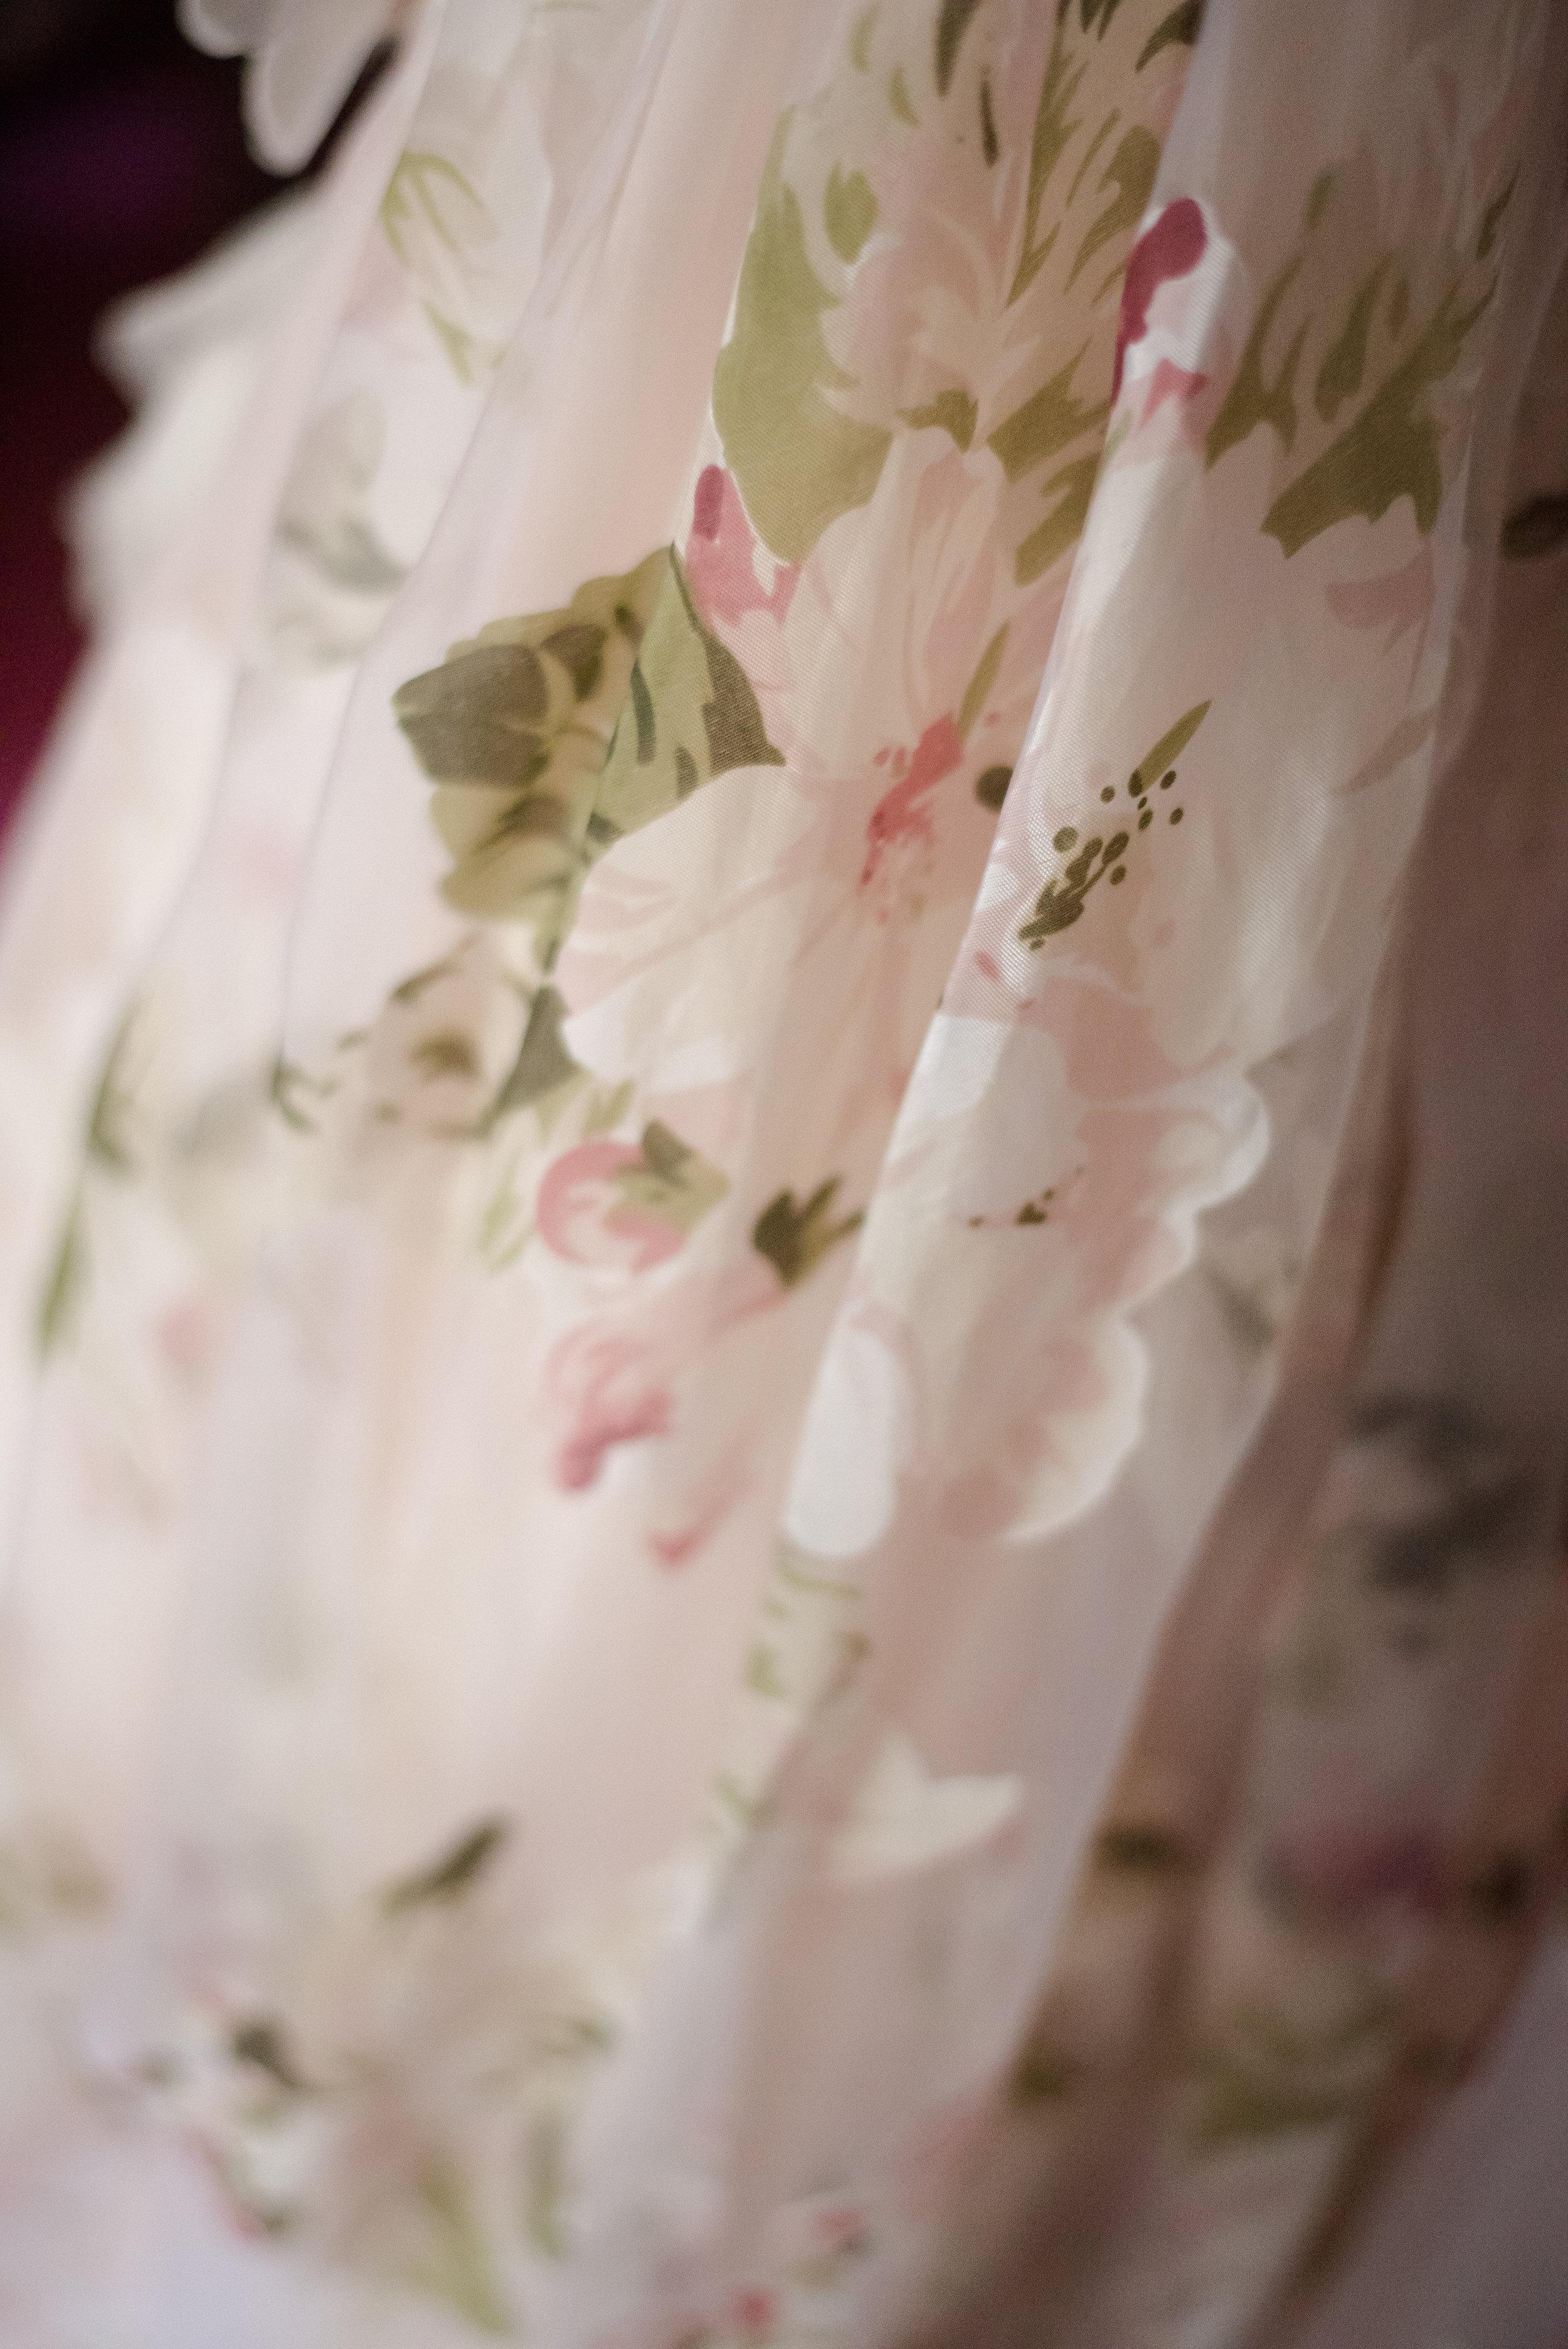 midsummers-eve-wedding-floral-blush-dress-david-tutera-cary-hill-plantation-photo-virginia-bride-15.jpg